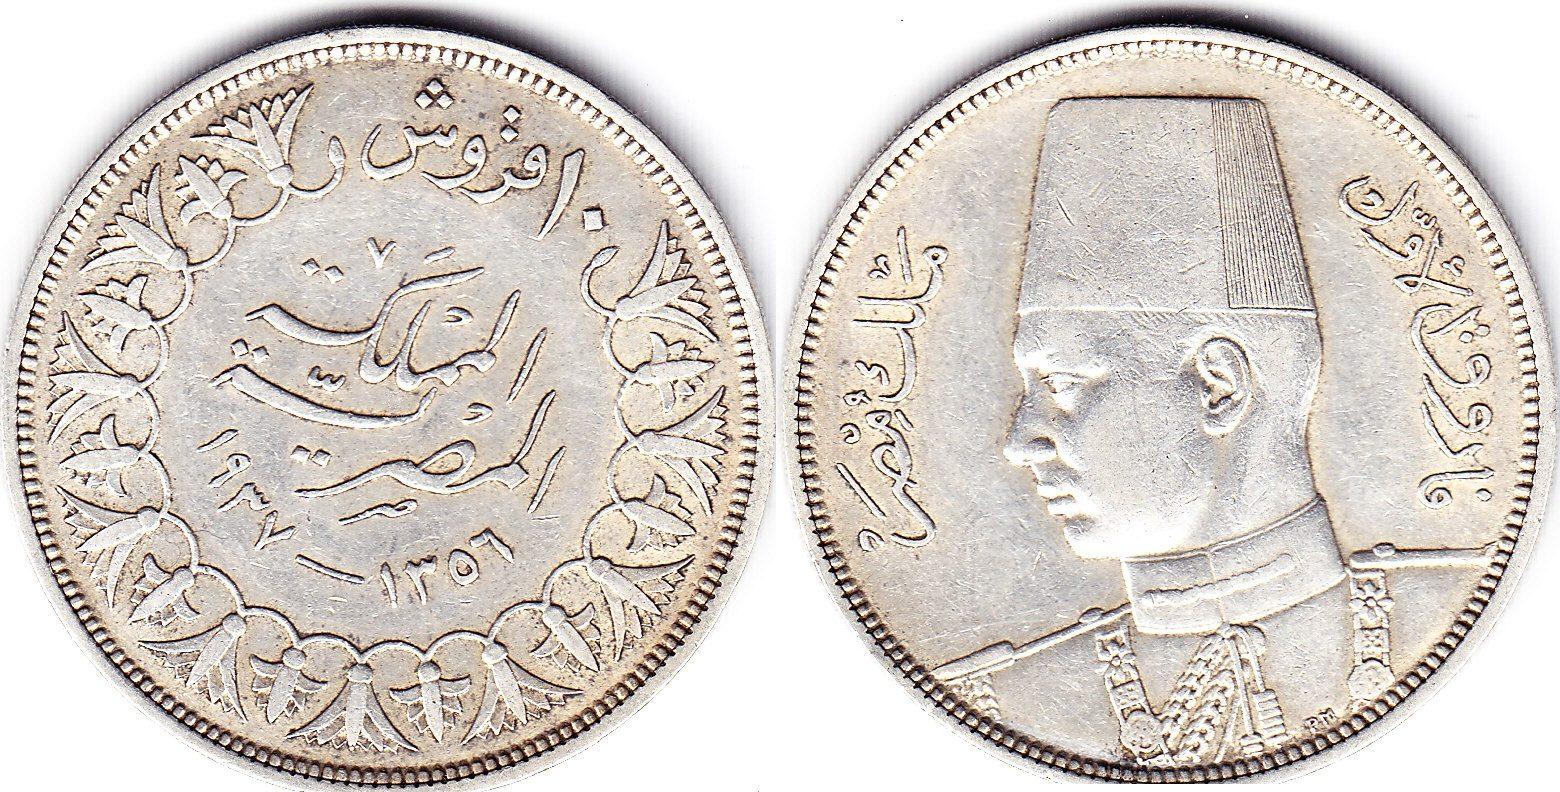 Ägypten 10 Piaster 1937 SS